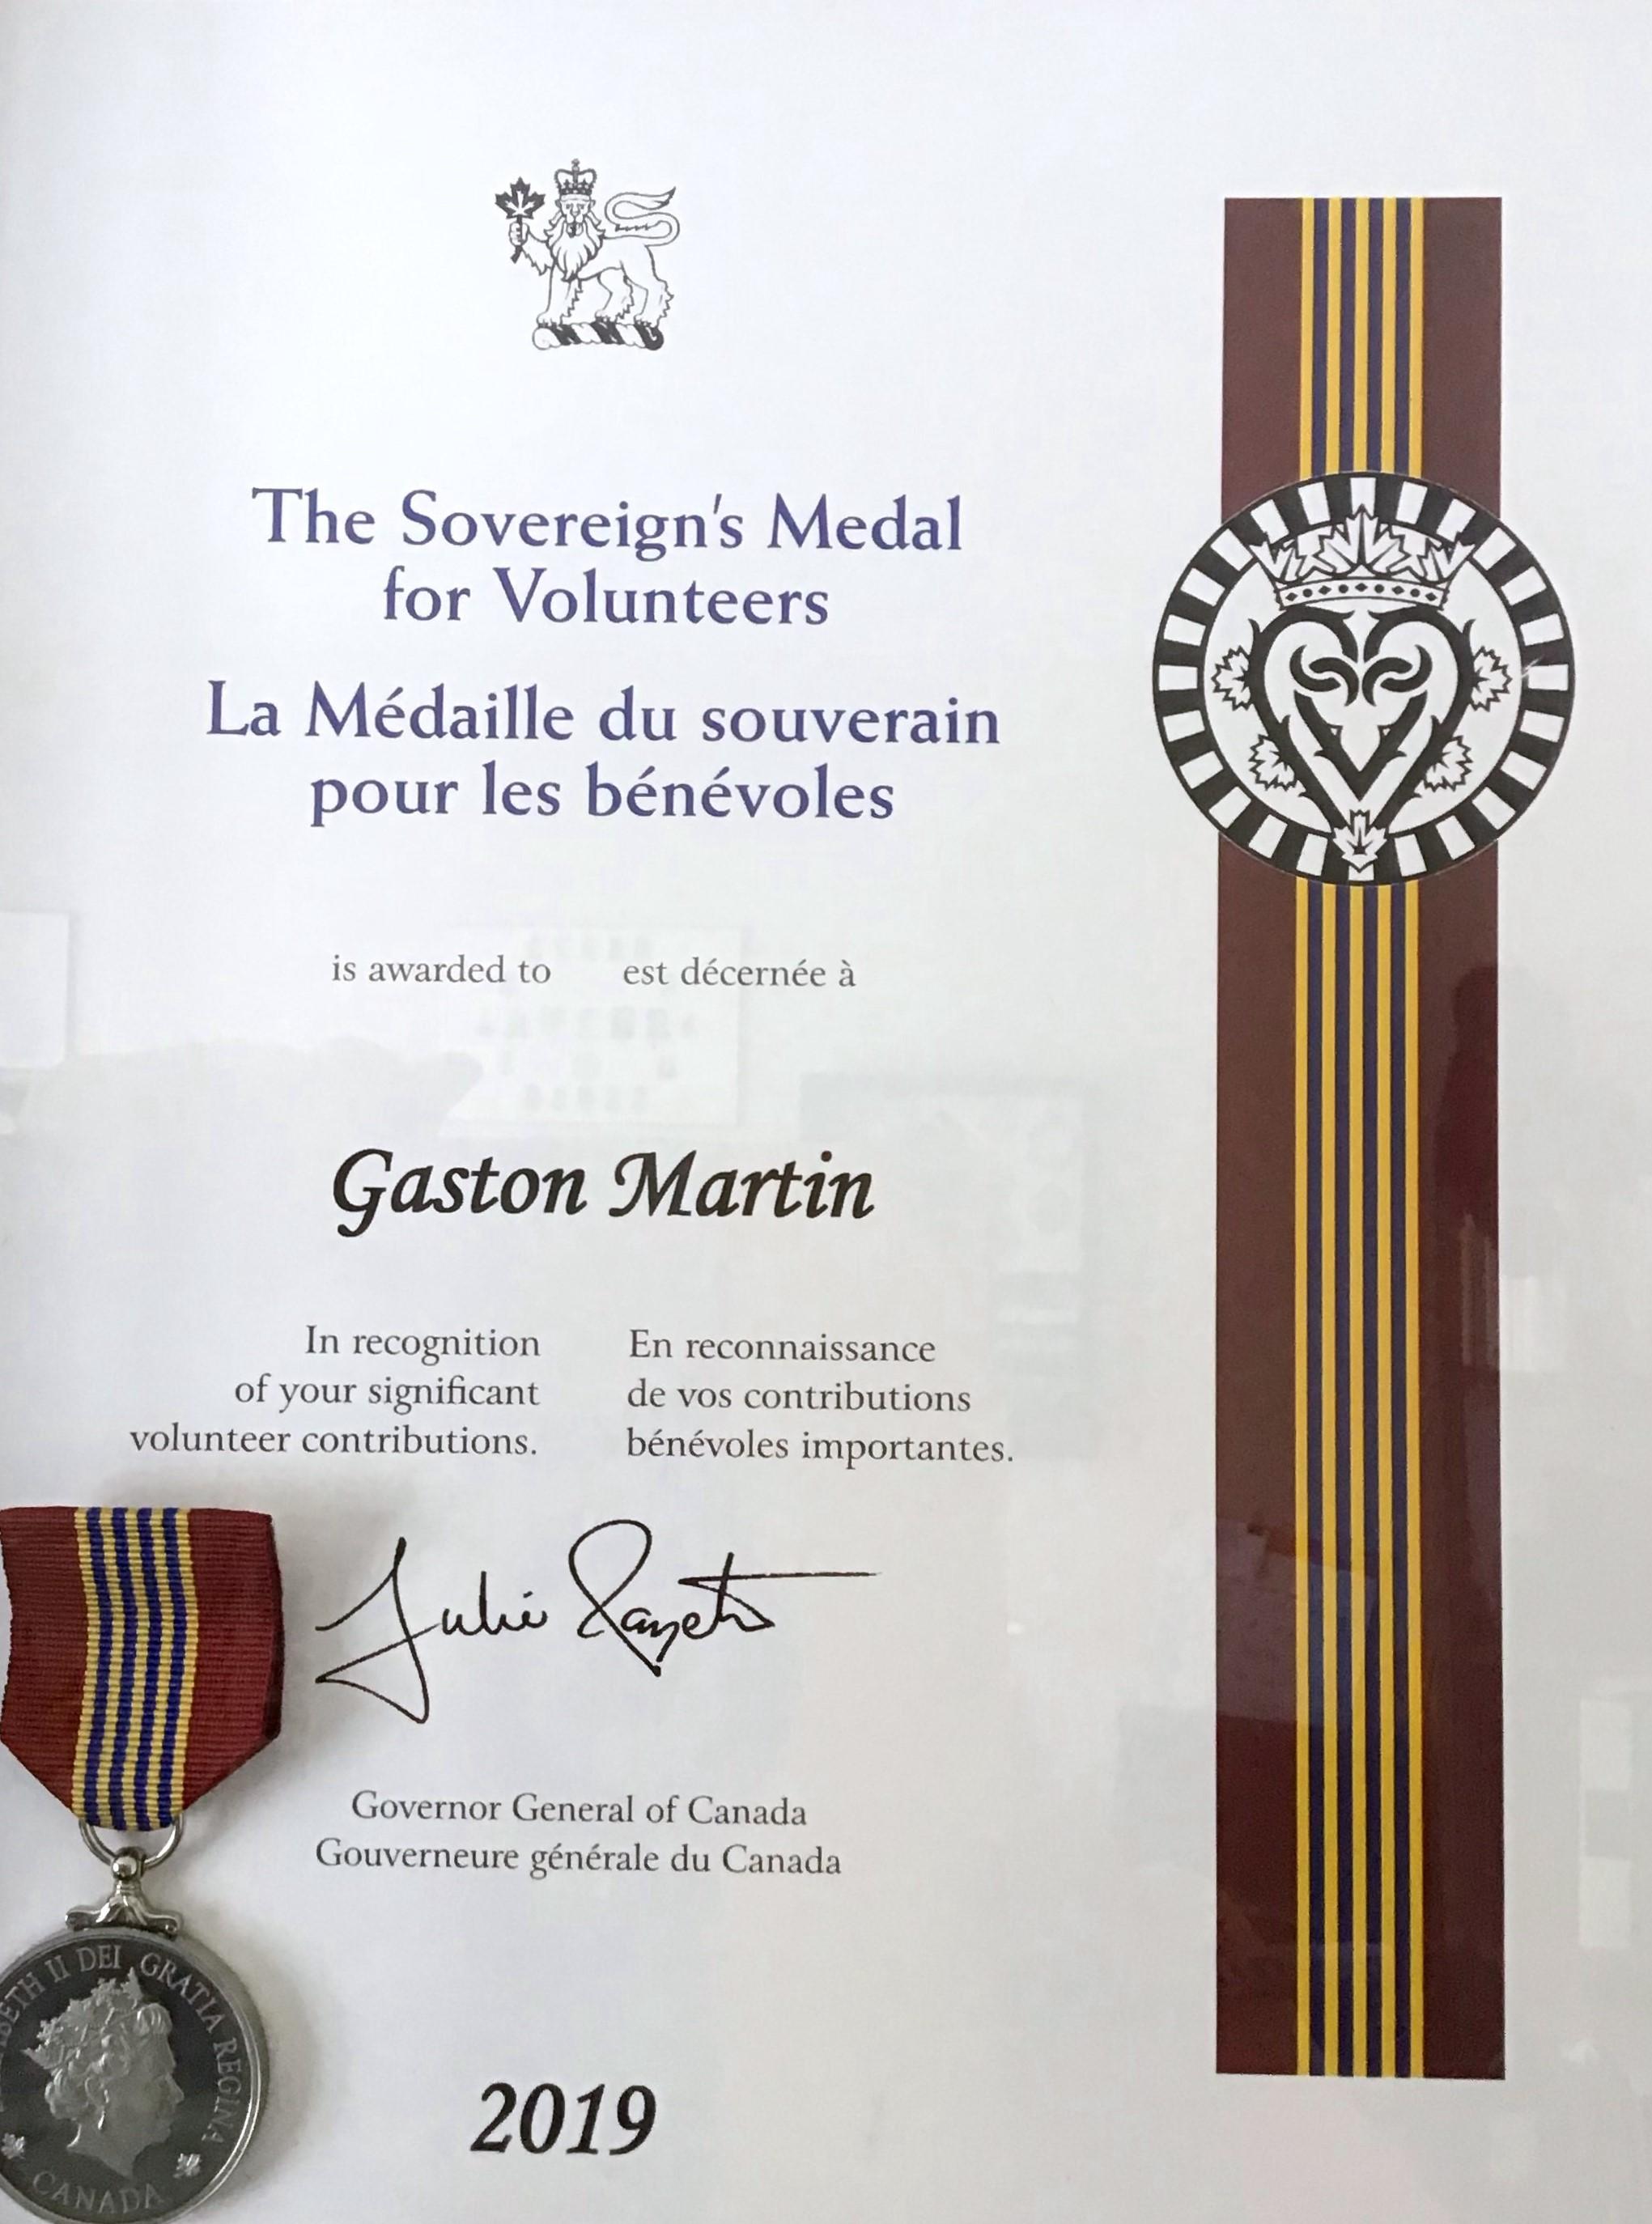 Gaston Martin